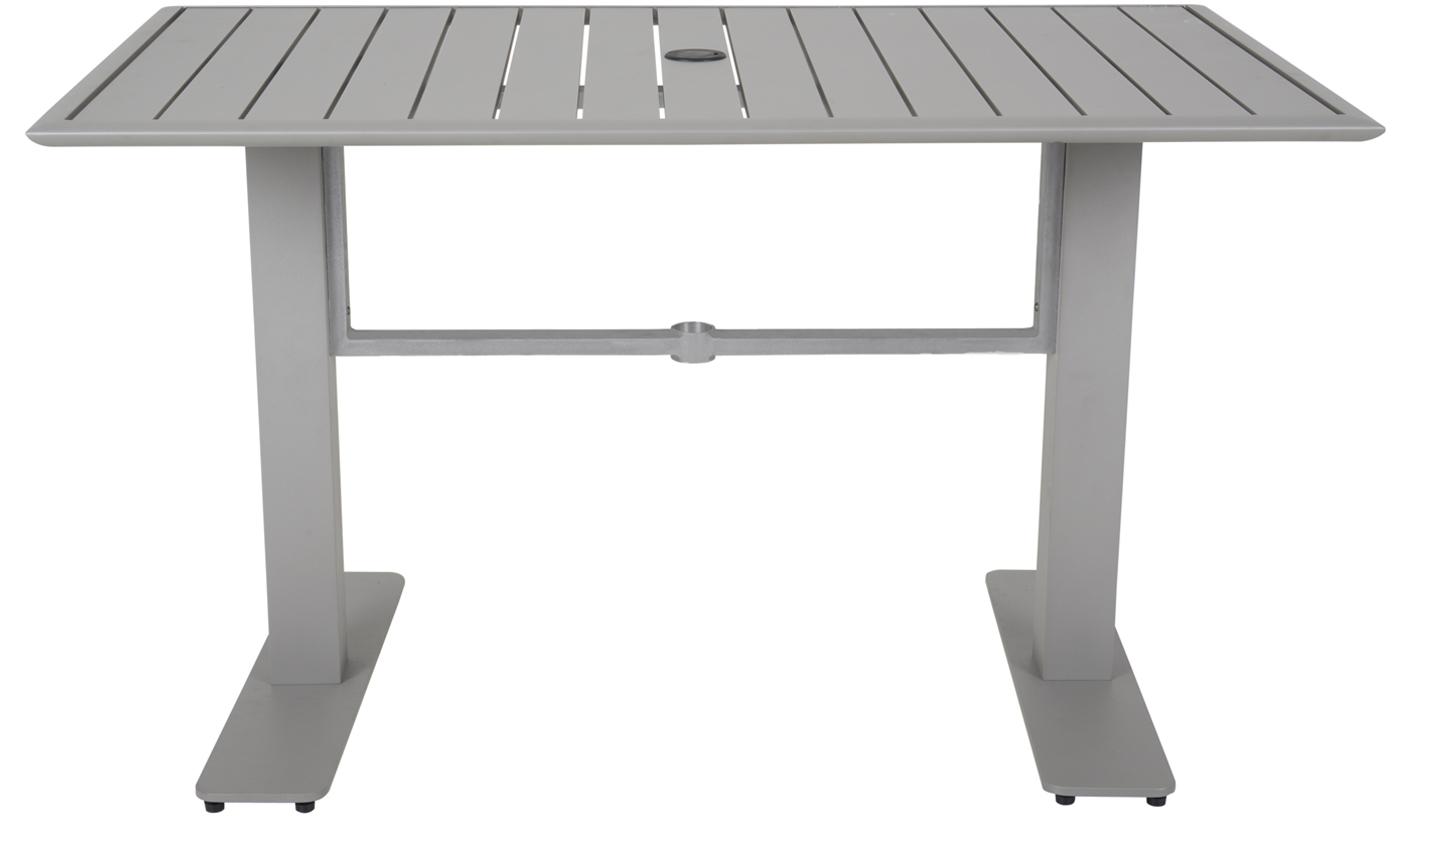 SOUTHBEACH-TABLE-BFM-3.jpg